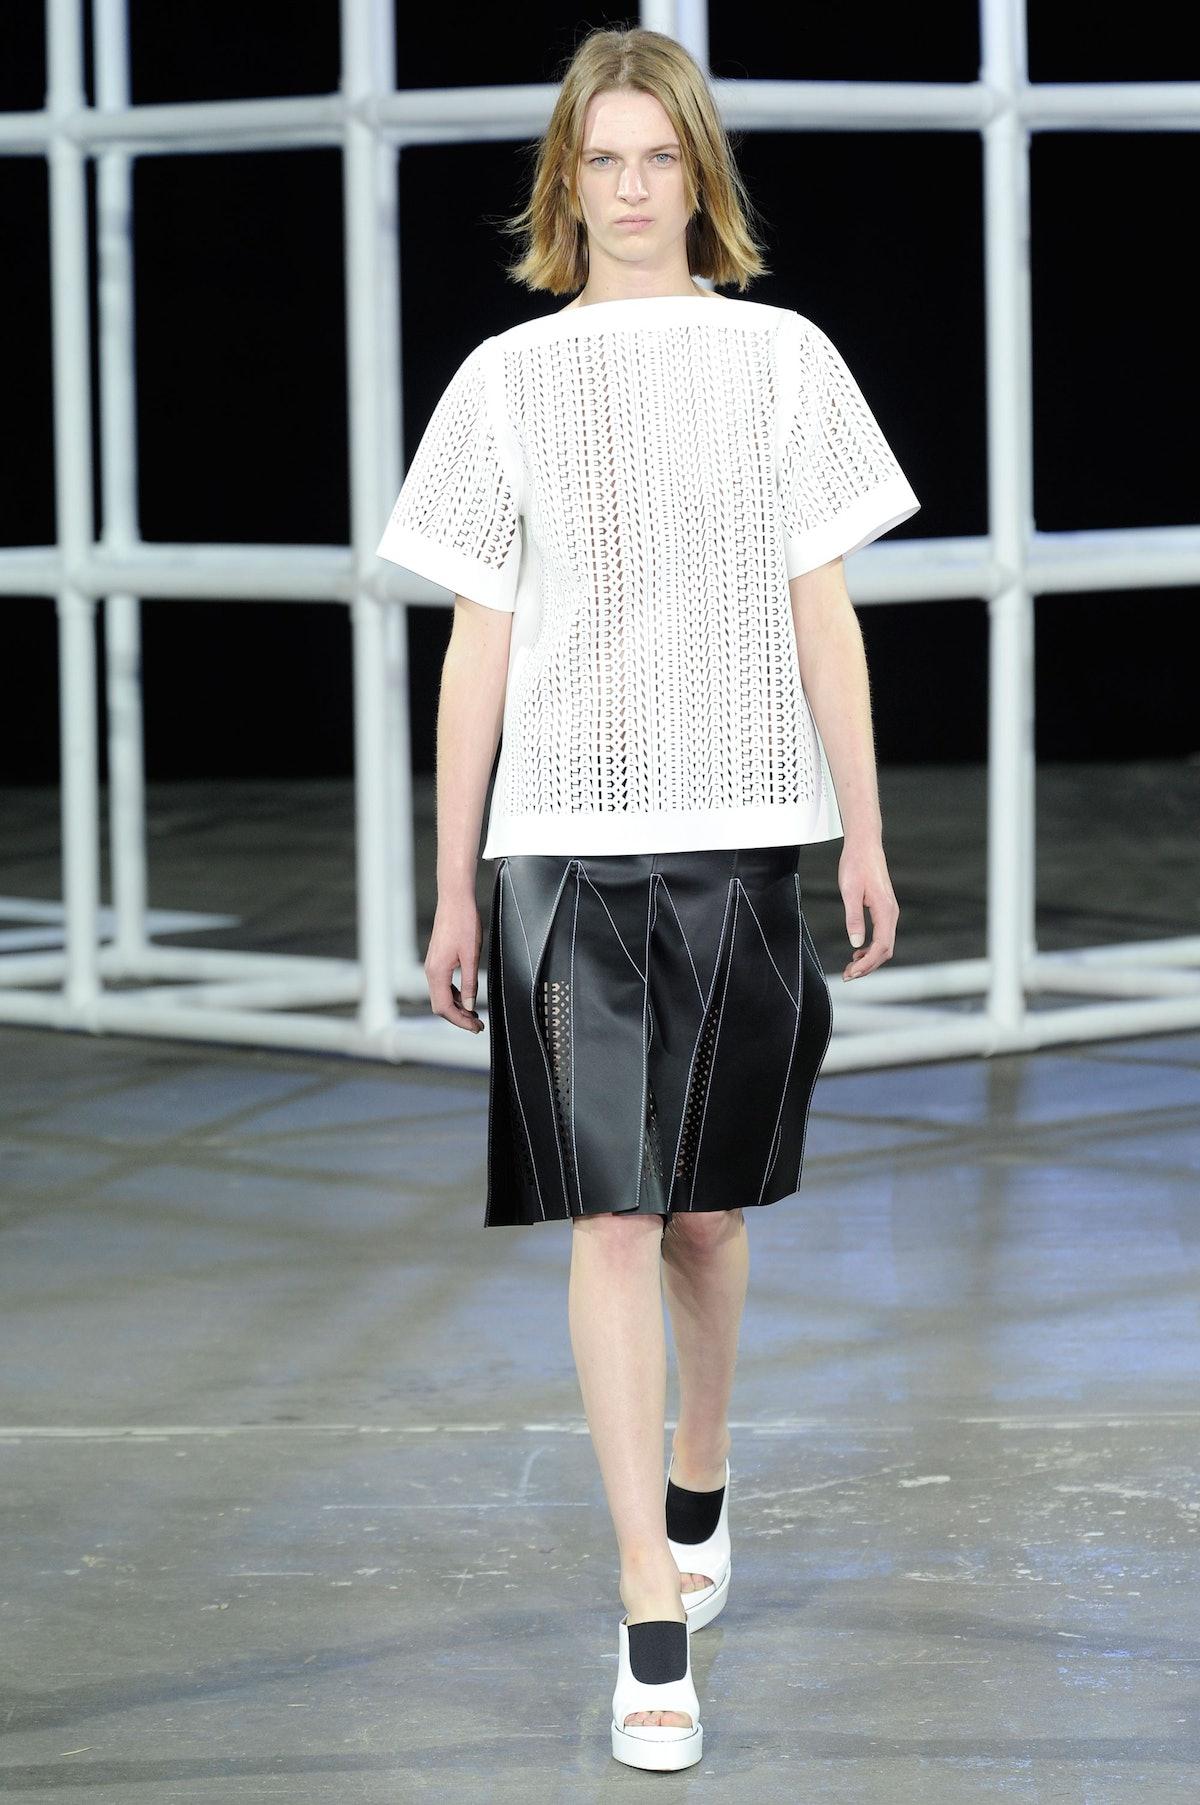 alexander-wang-spring-2014-laser-cut-leather